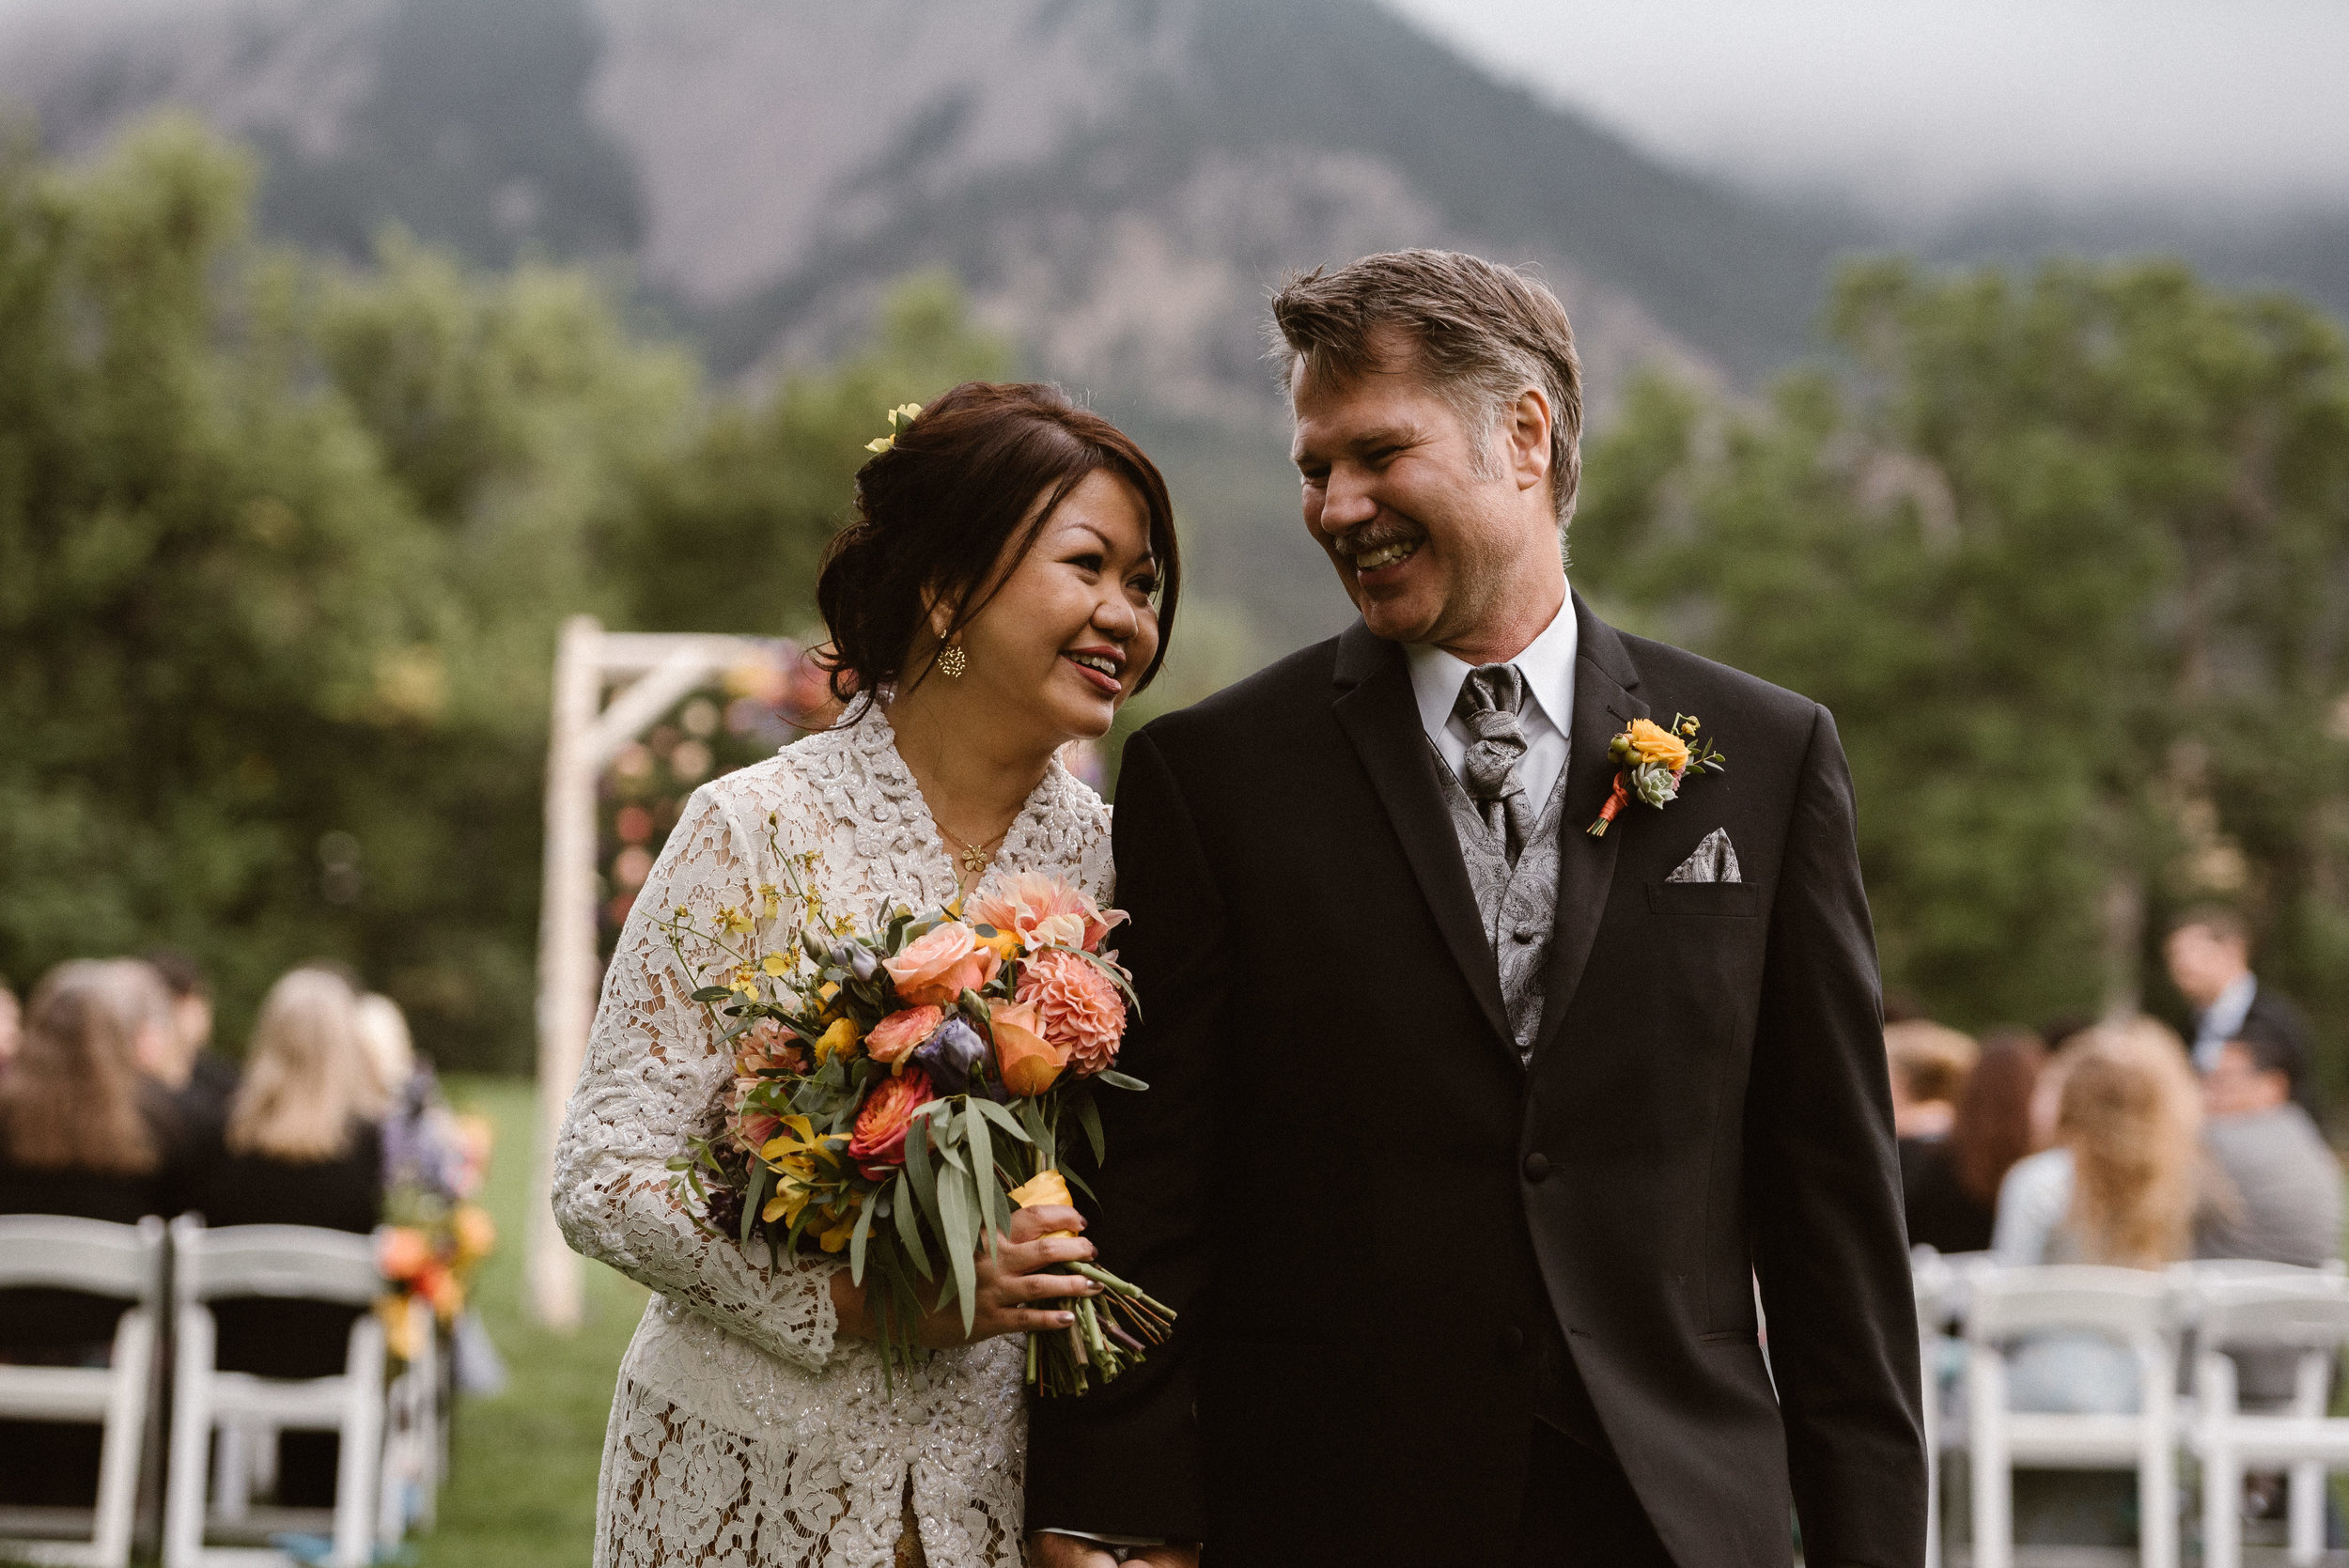 Bride and Groom at Outdoor Ceremony in Chautauqua Park, Boulder, Colorado